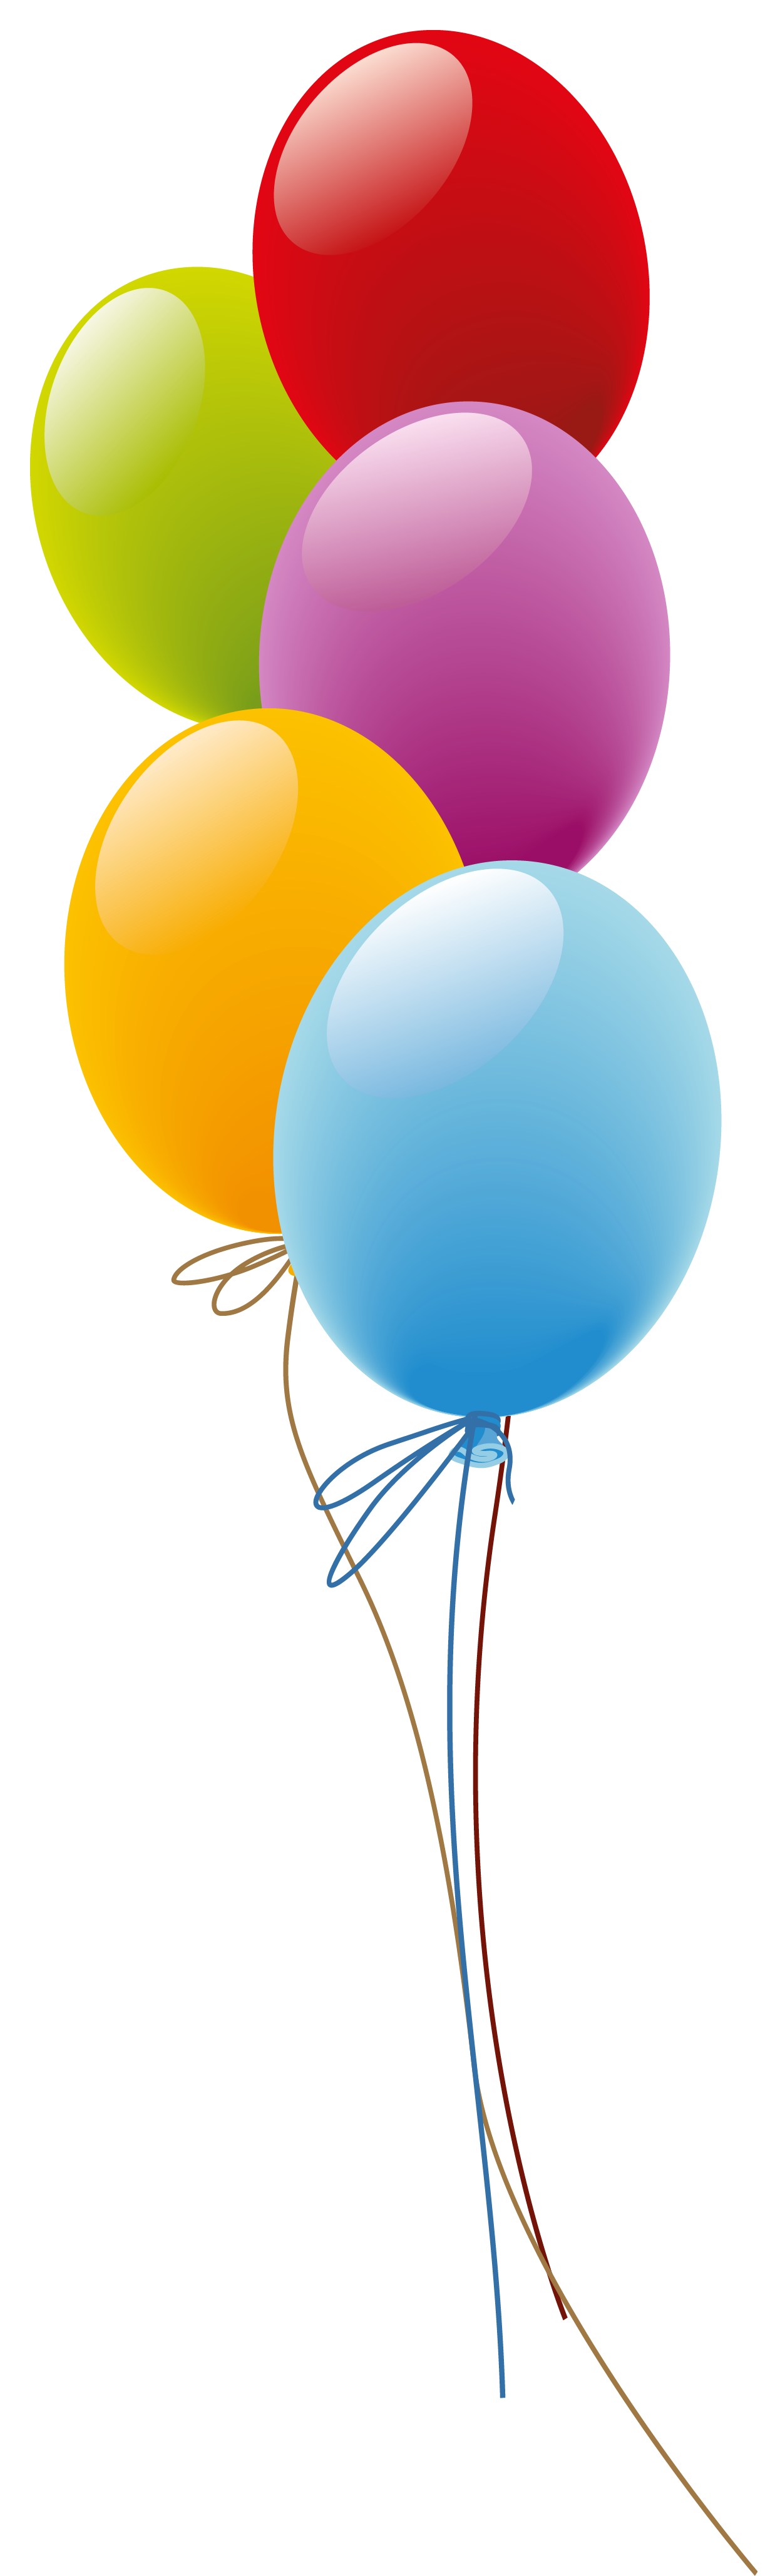 balloons png picture artistic elements balloons pinterest rh pinterest com Balloons and Confetti Clip Art Bubbles Clip Art Transparent Background